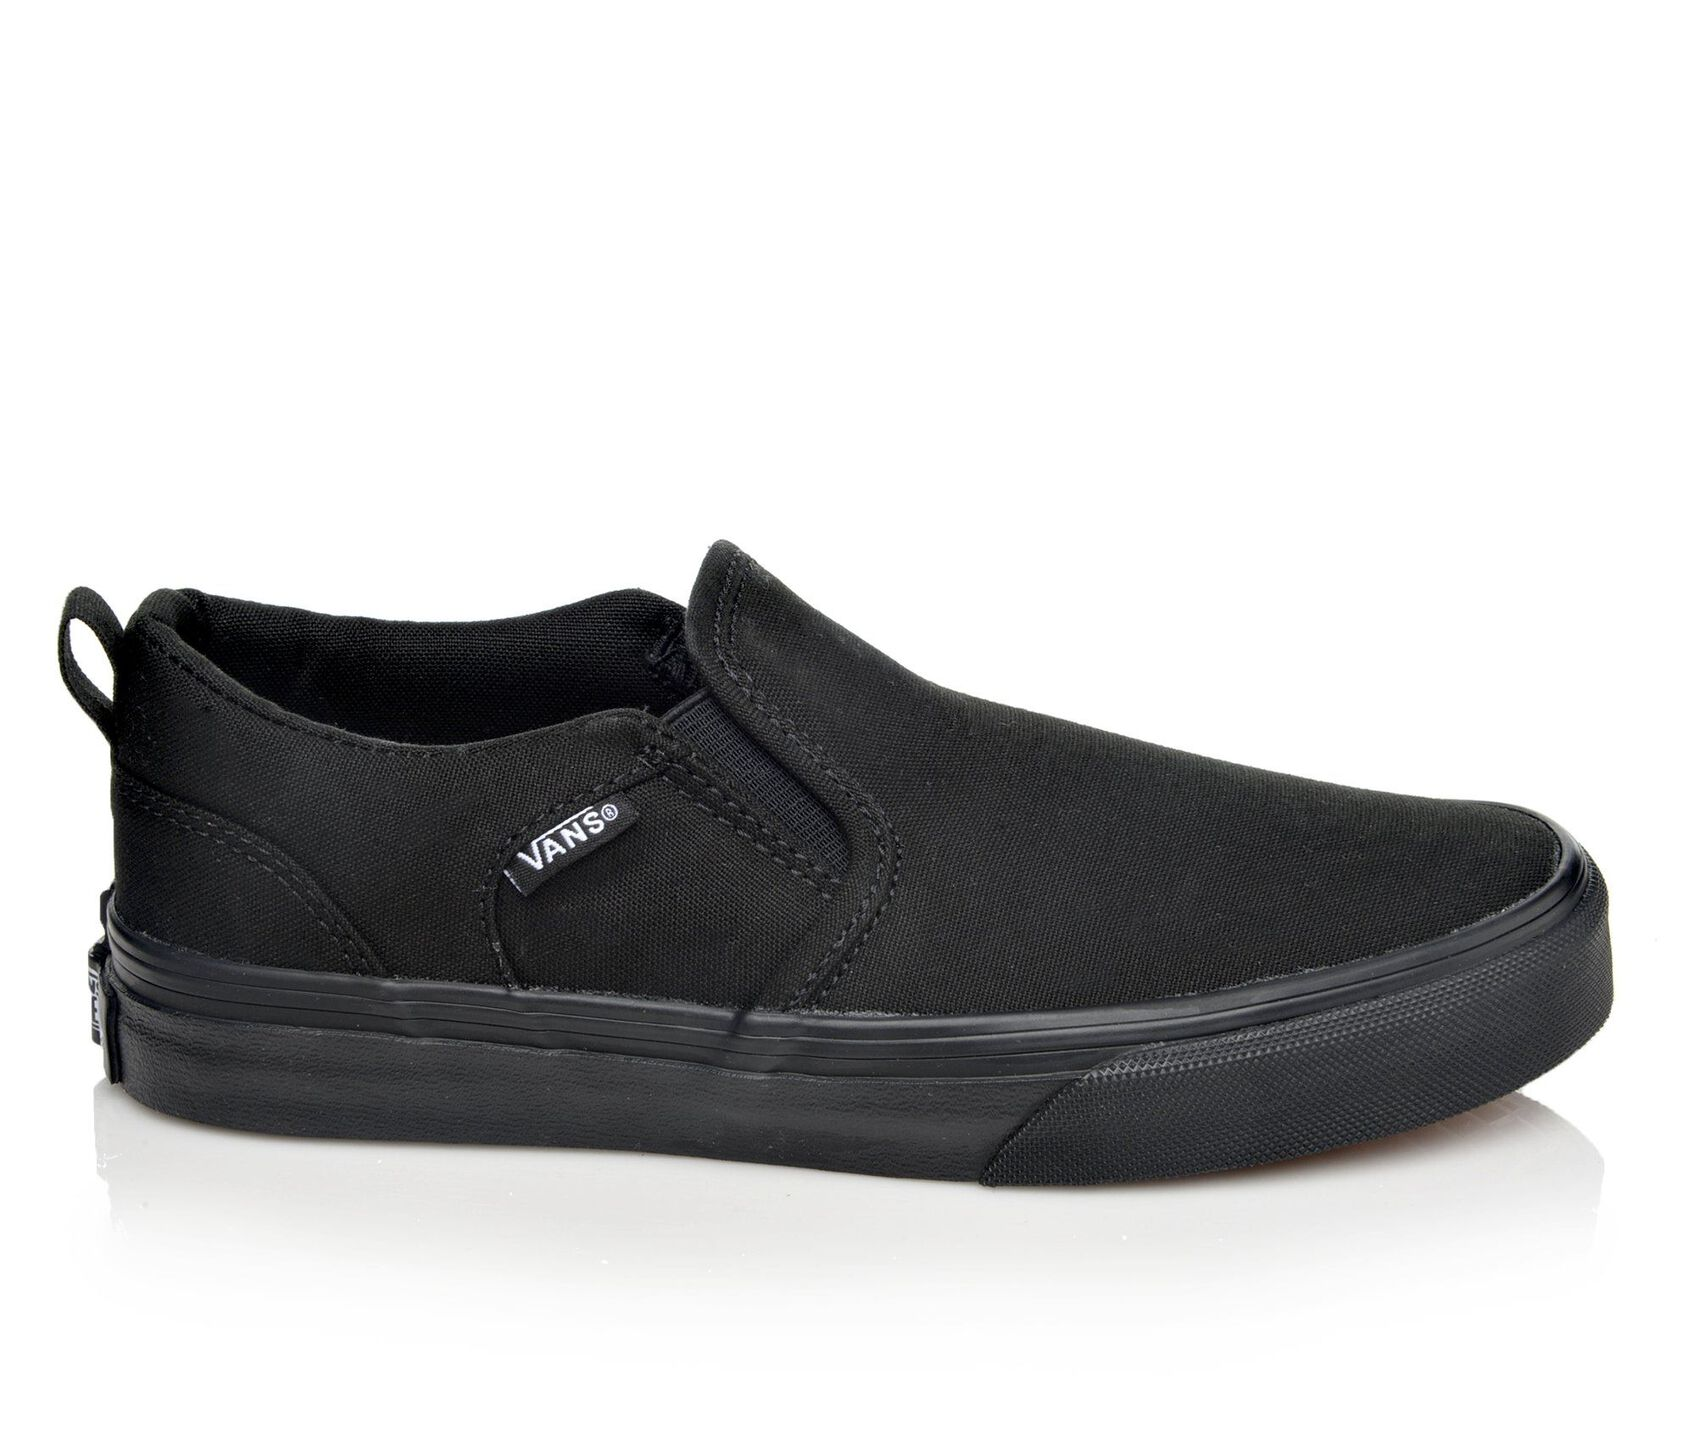 vans shoes black and white boys. images vans shoes black and white boys